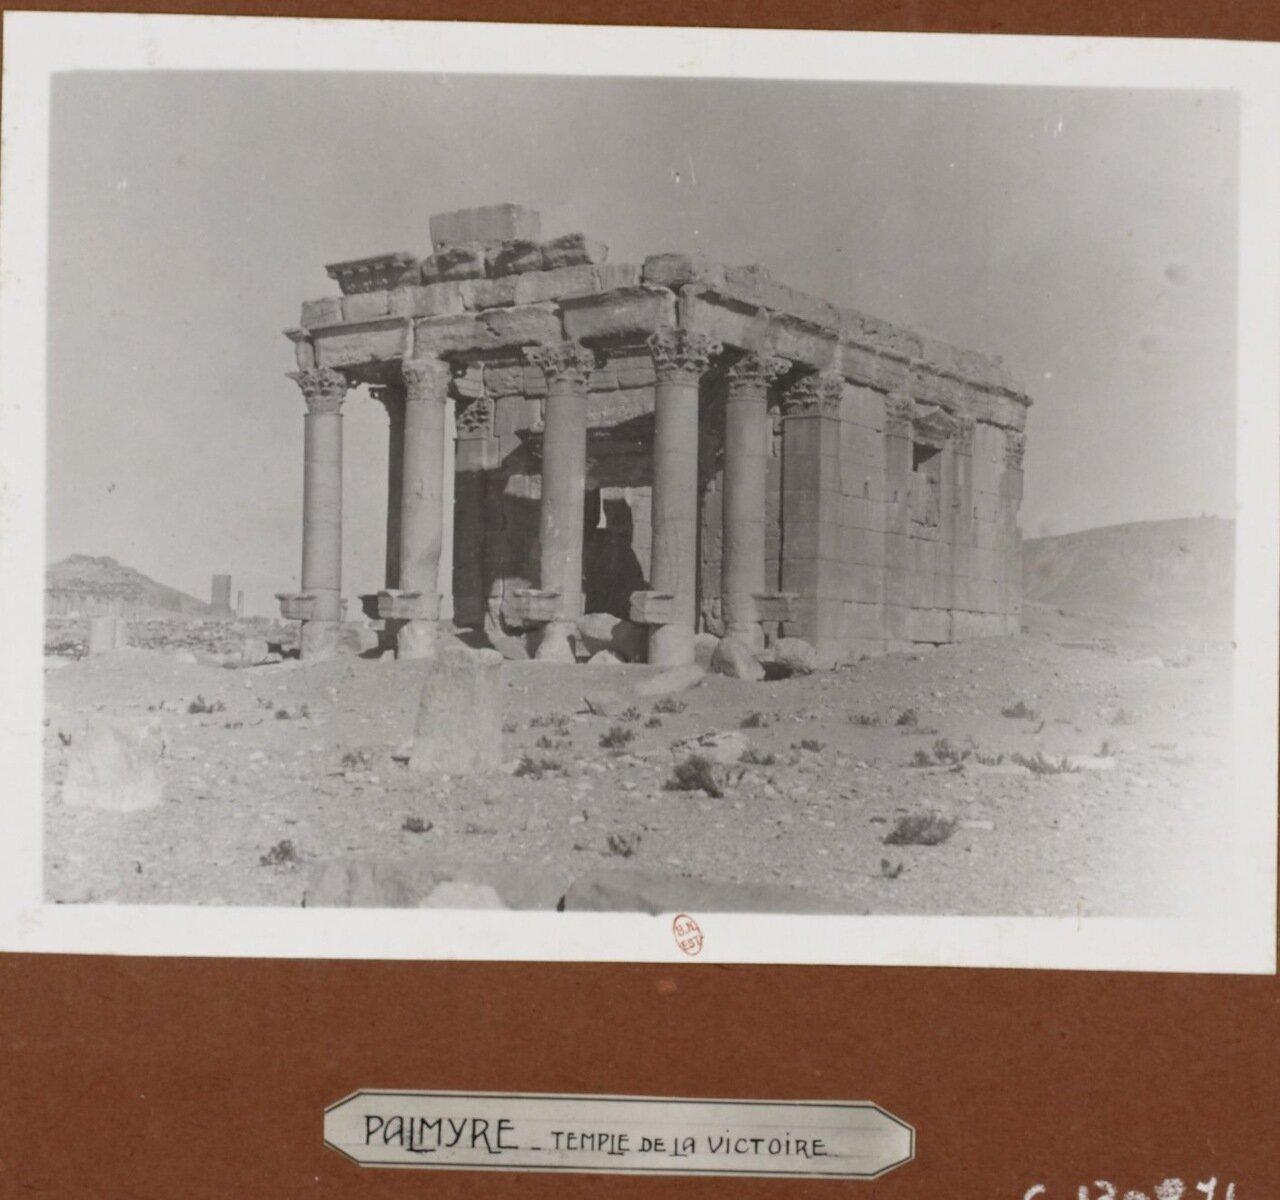 Пальмира. Храм Победы